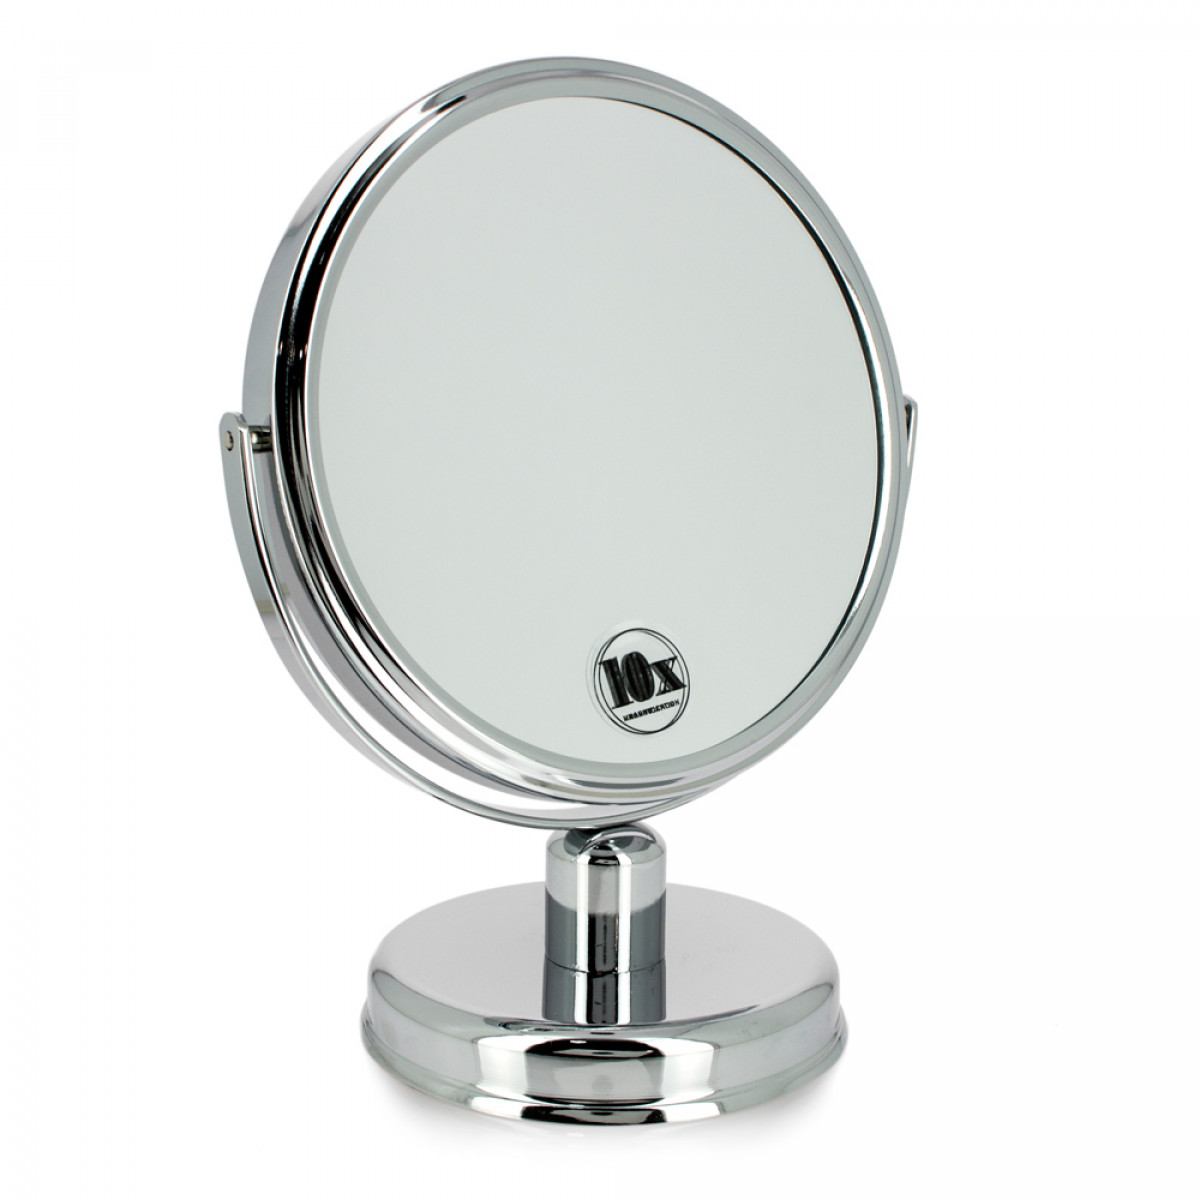 miroir grossissant x10 notre